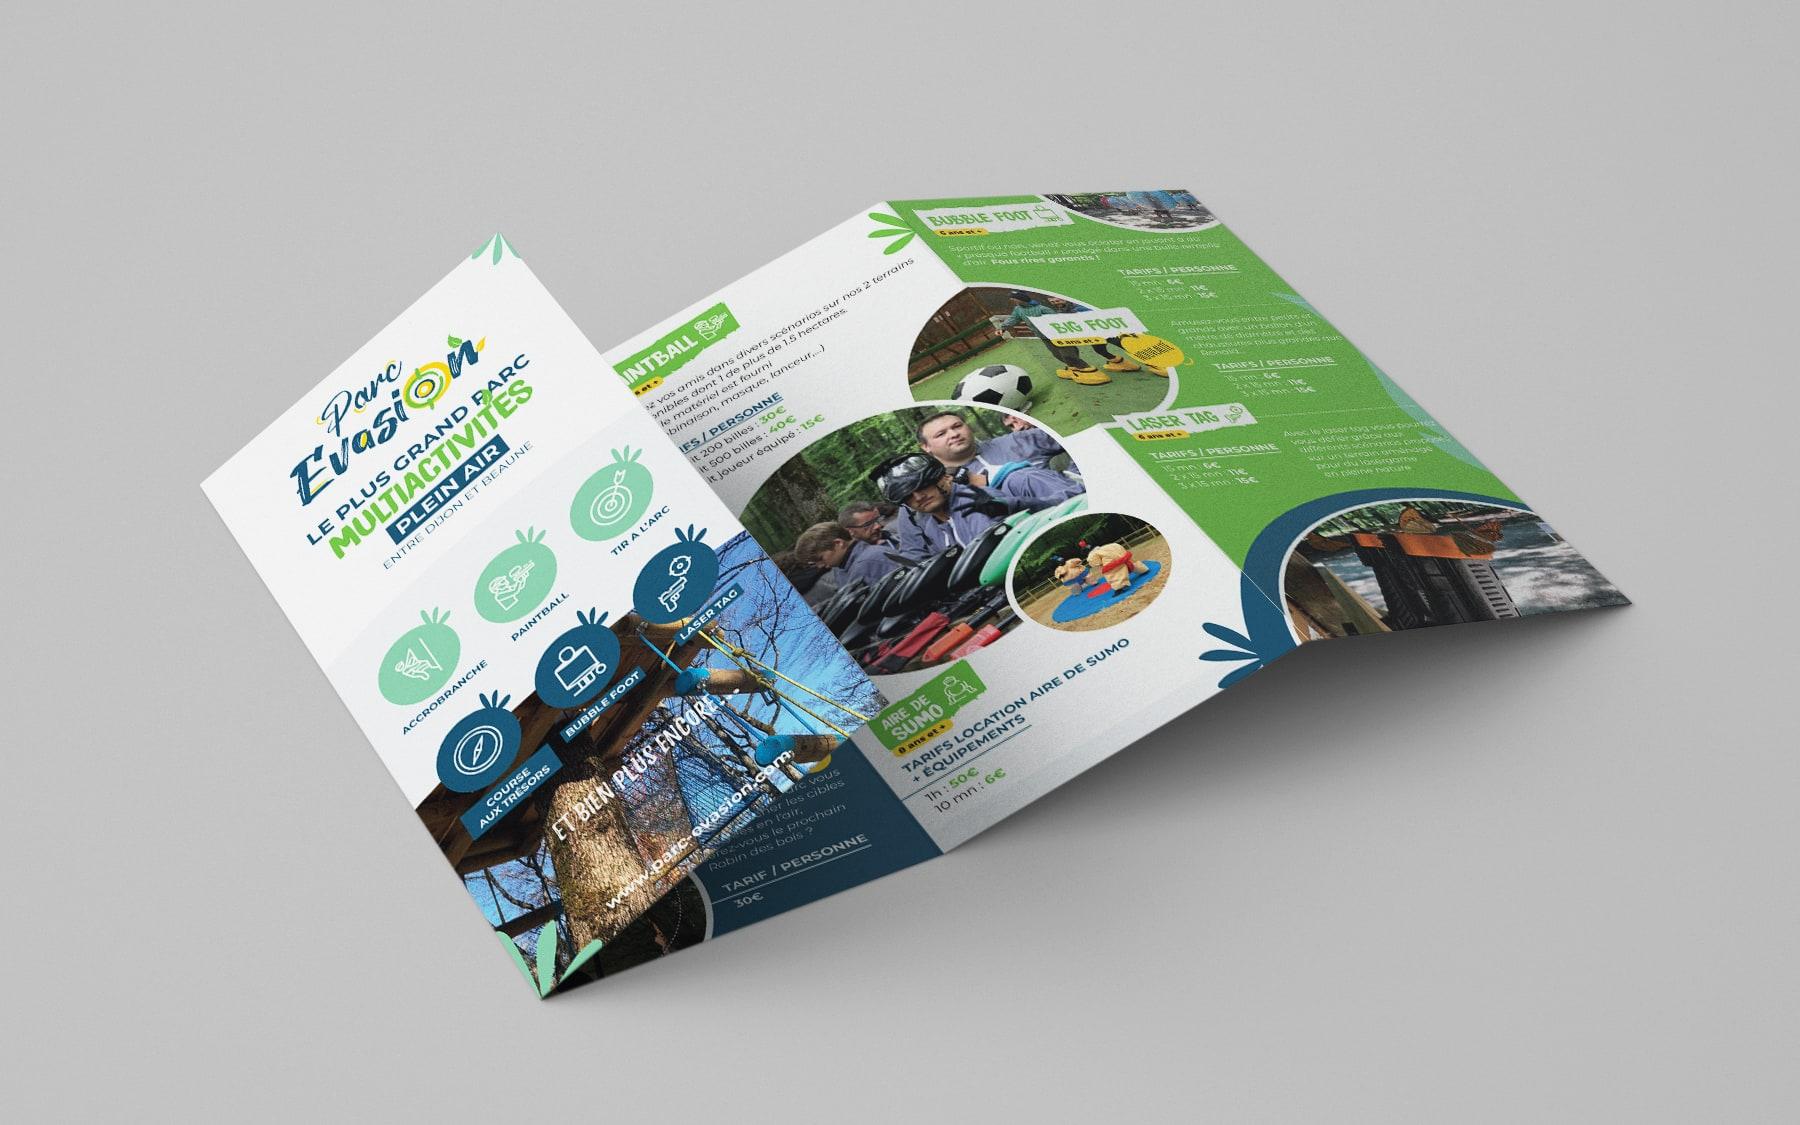 eclolink-agence-web-marketing-dijon-reference-client-parc-evasion-mockup-depliant-4-volets